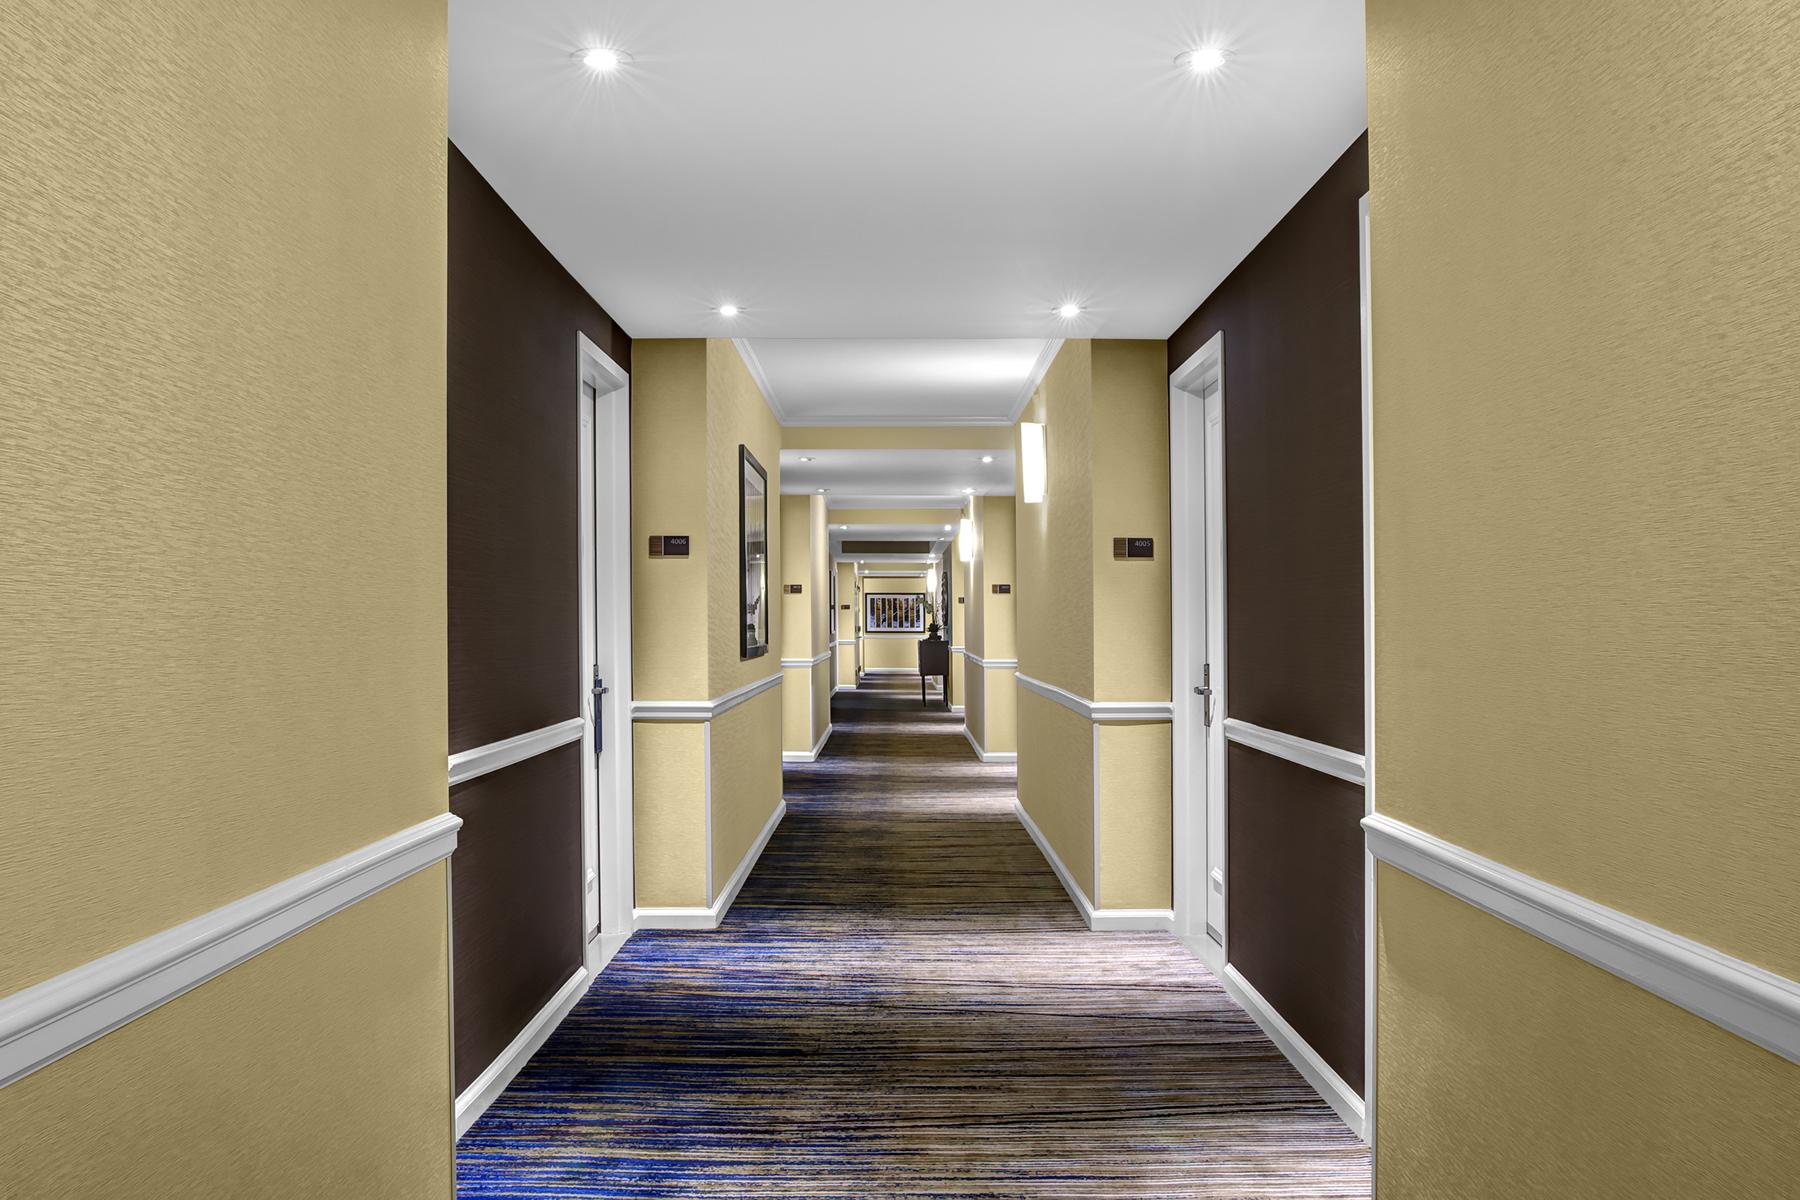 hilton-times-square-hallway